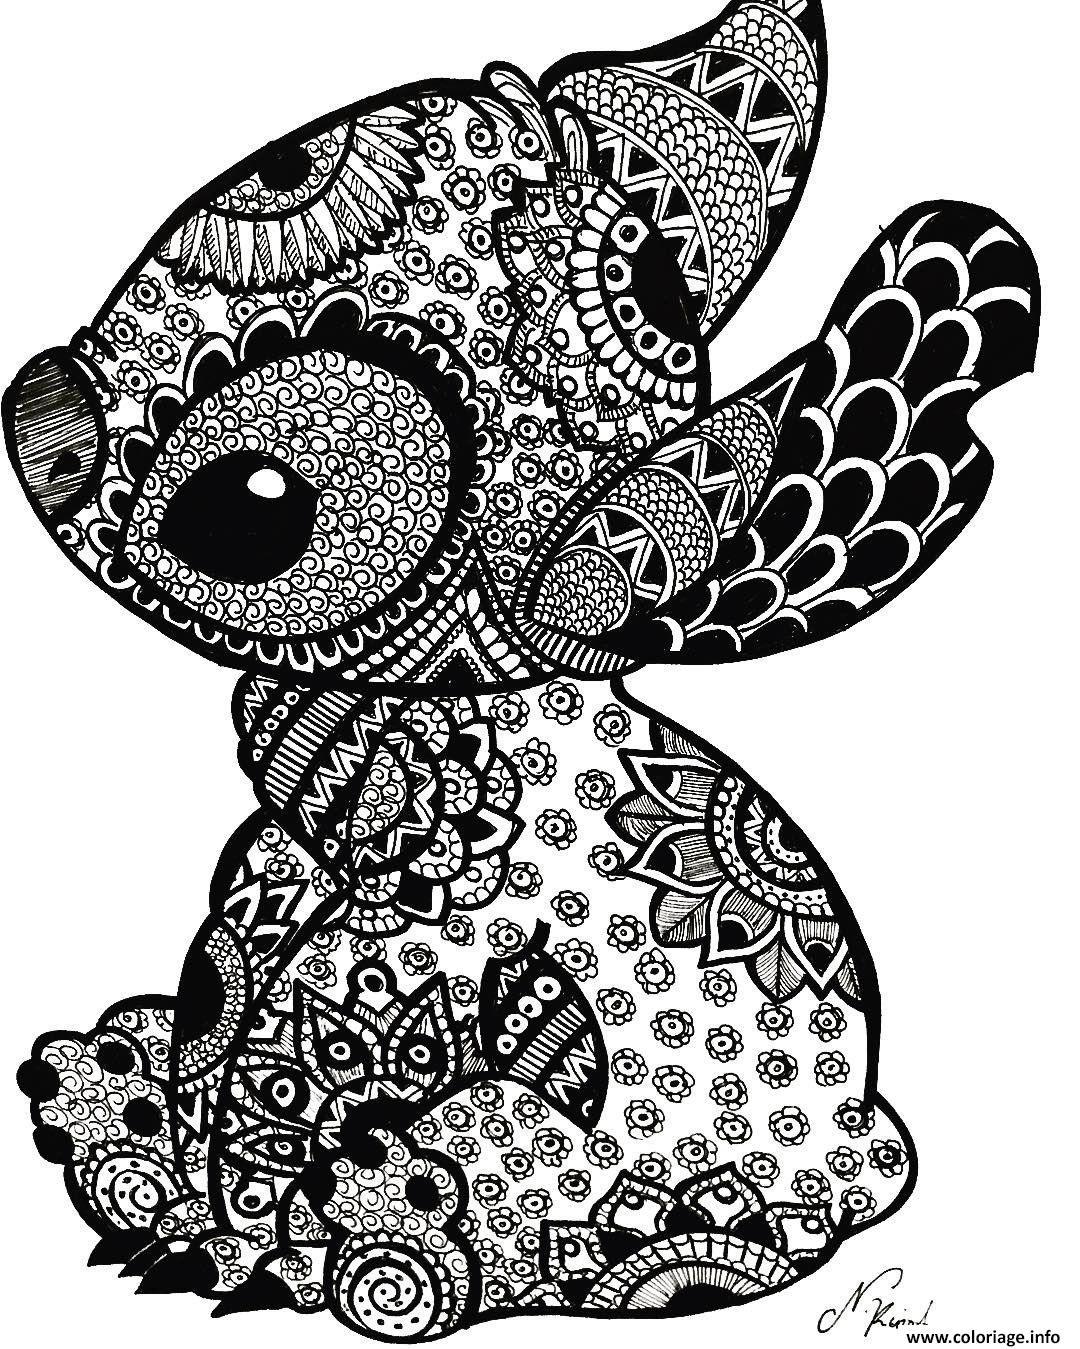 Dessin stitch mandala adulte zentangle Coloriage Gratuit à Imprimer